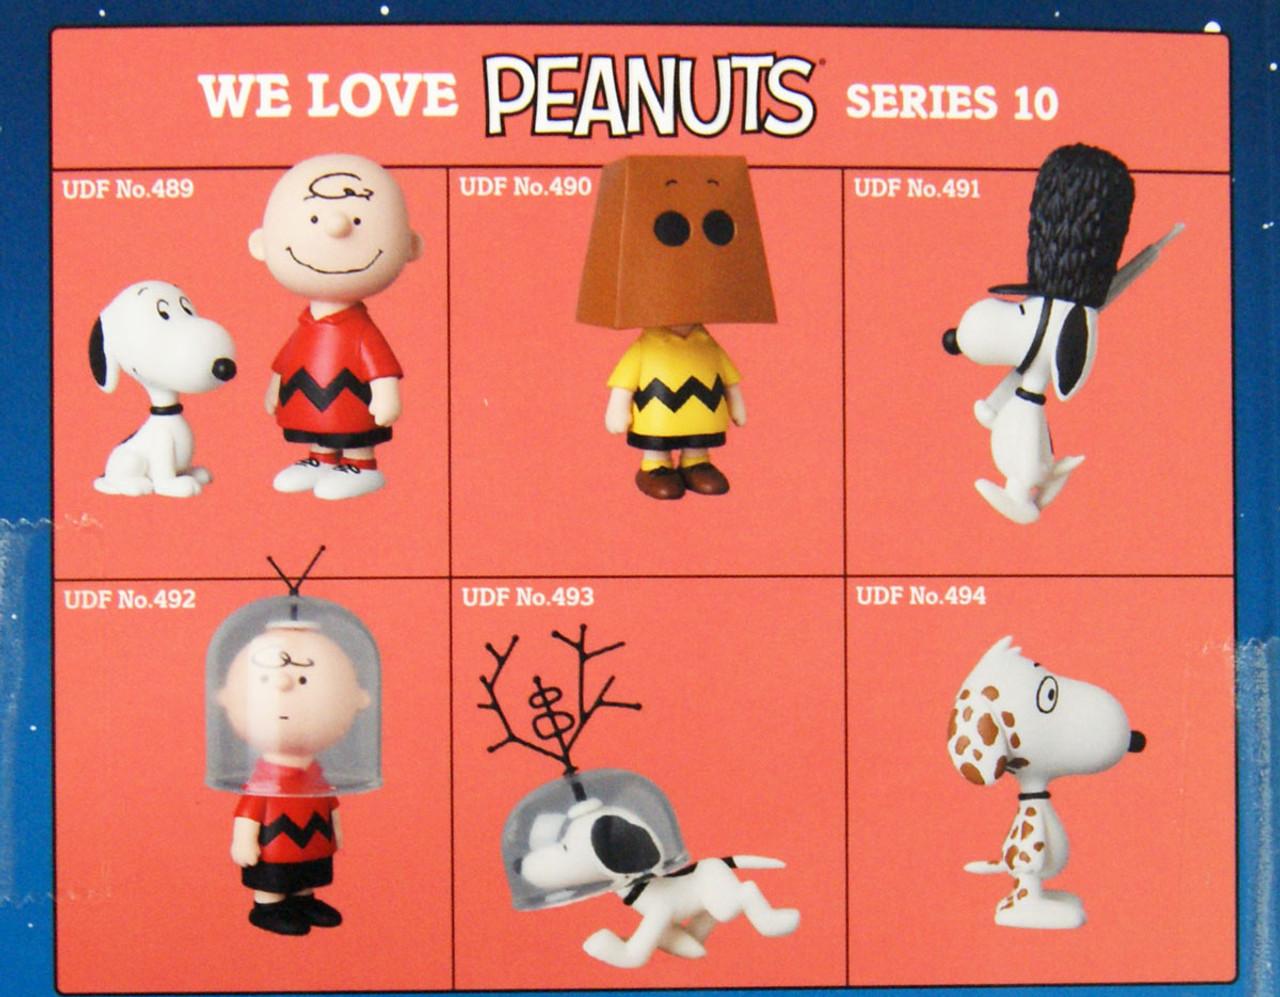 Medicom UDF-489 Ultra Detail Figure Peanuts Series 10 Charlie Brown /& Snoopy